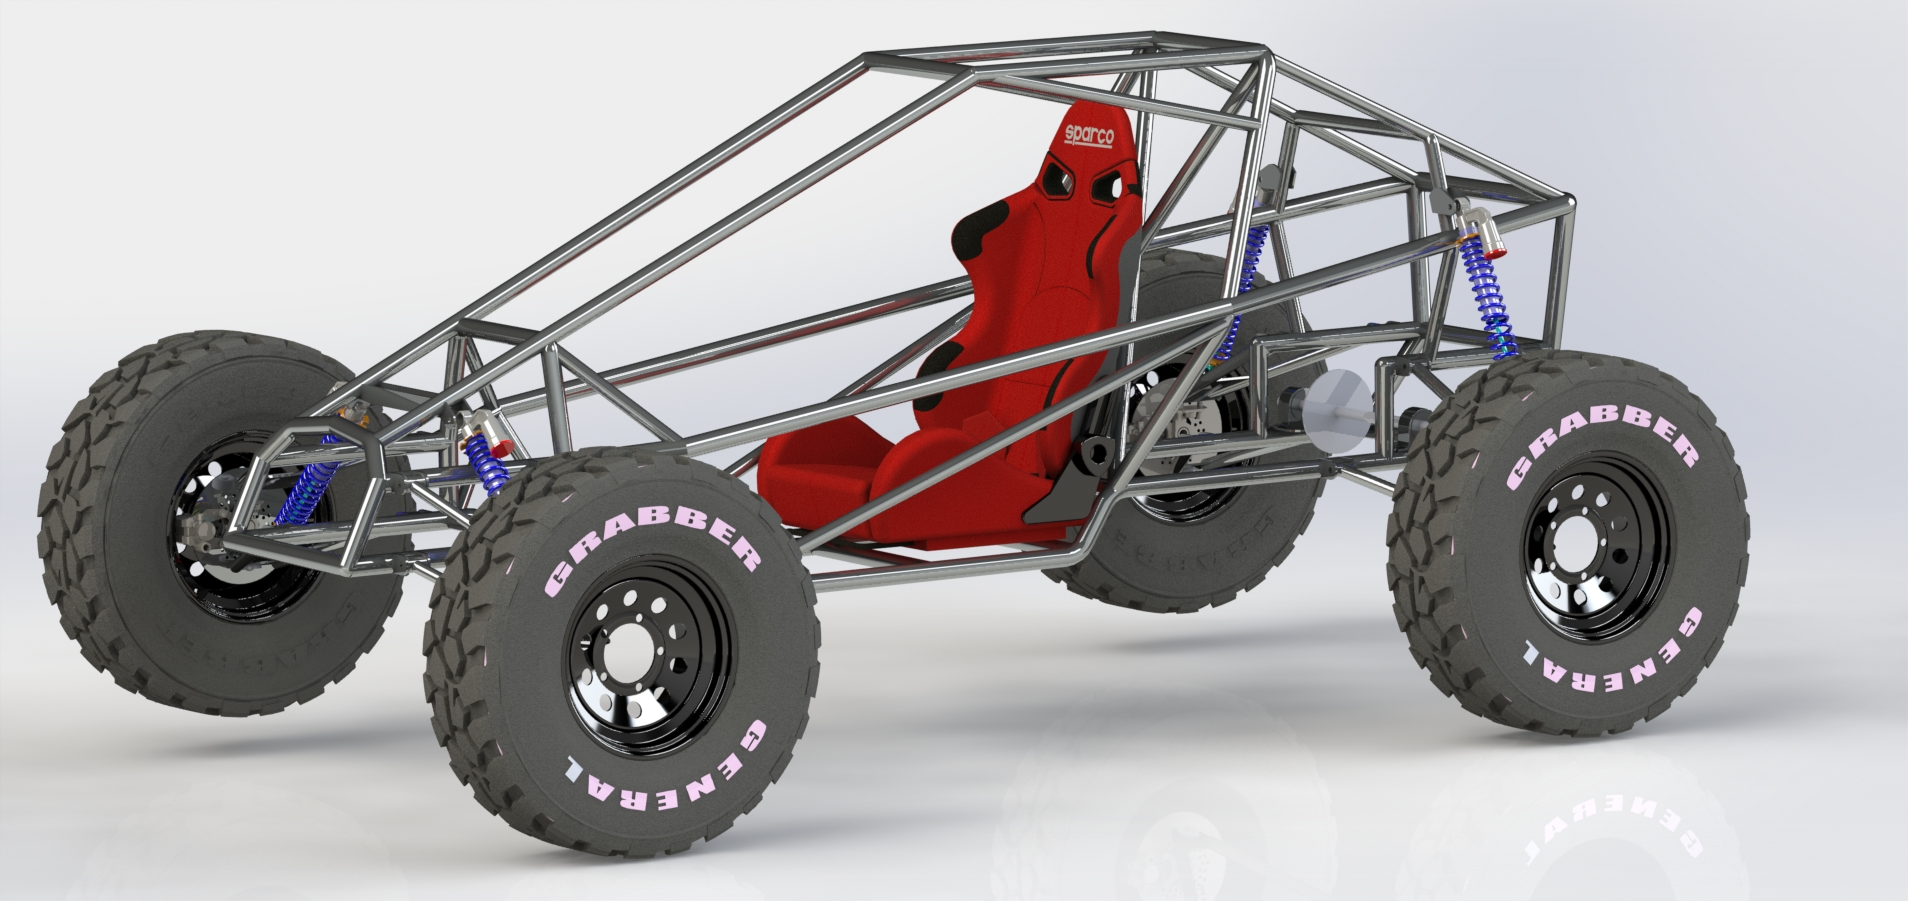 KARTCROSS钢管车架模型3D图纸 STEP格式